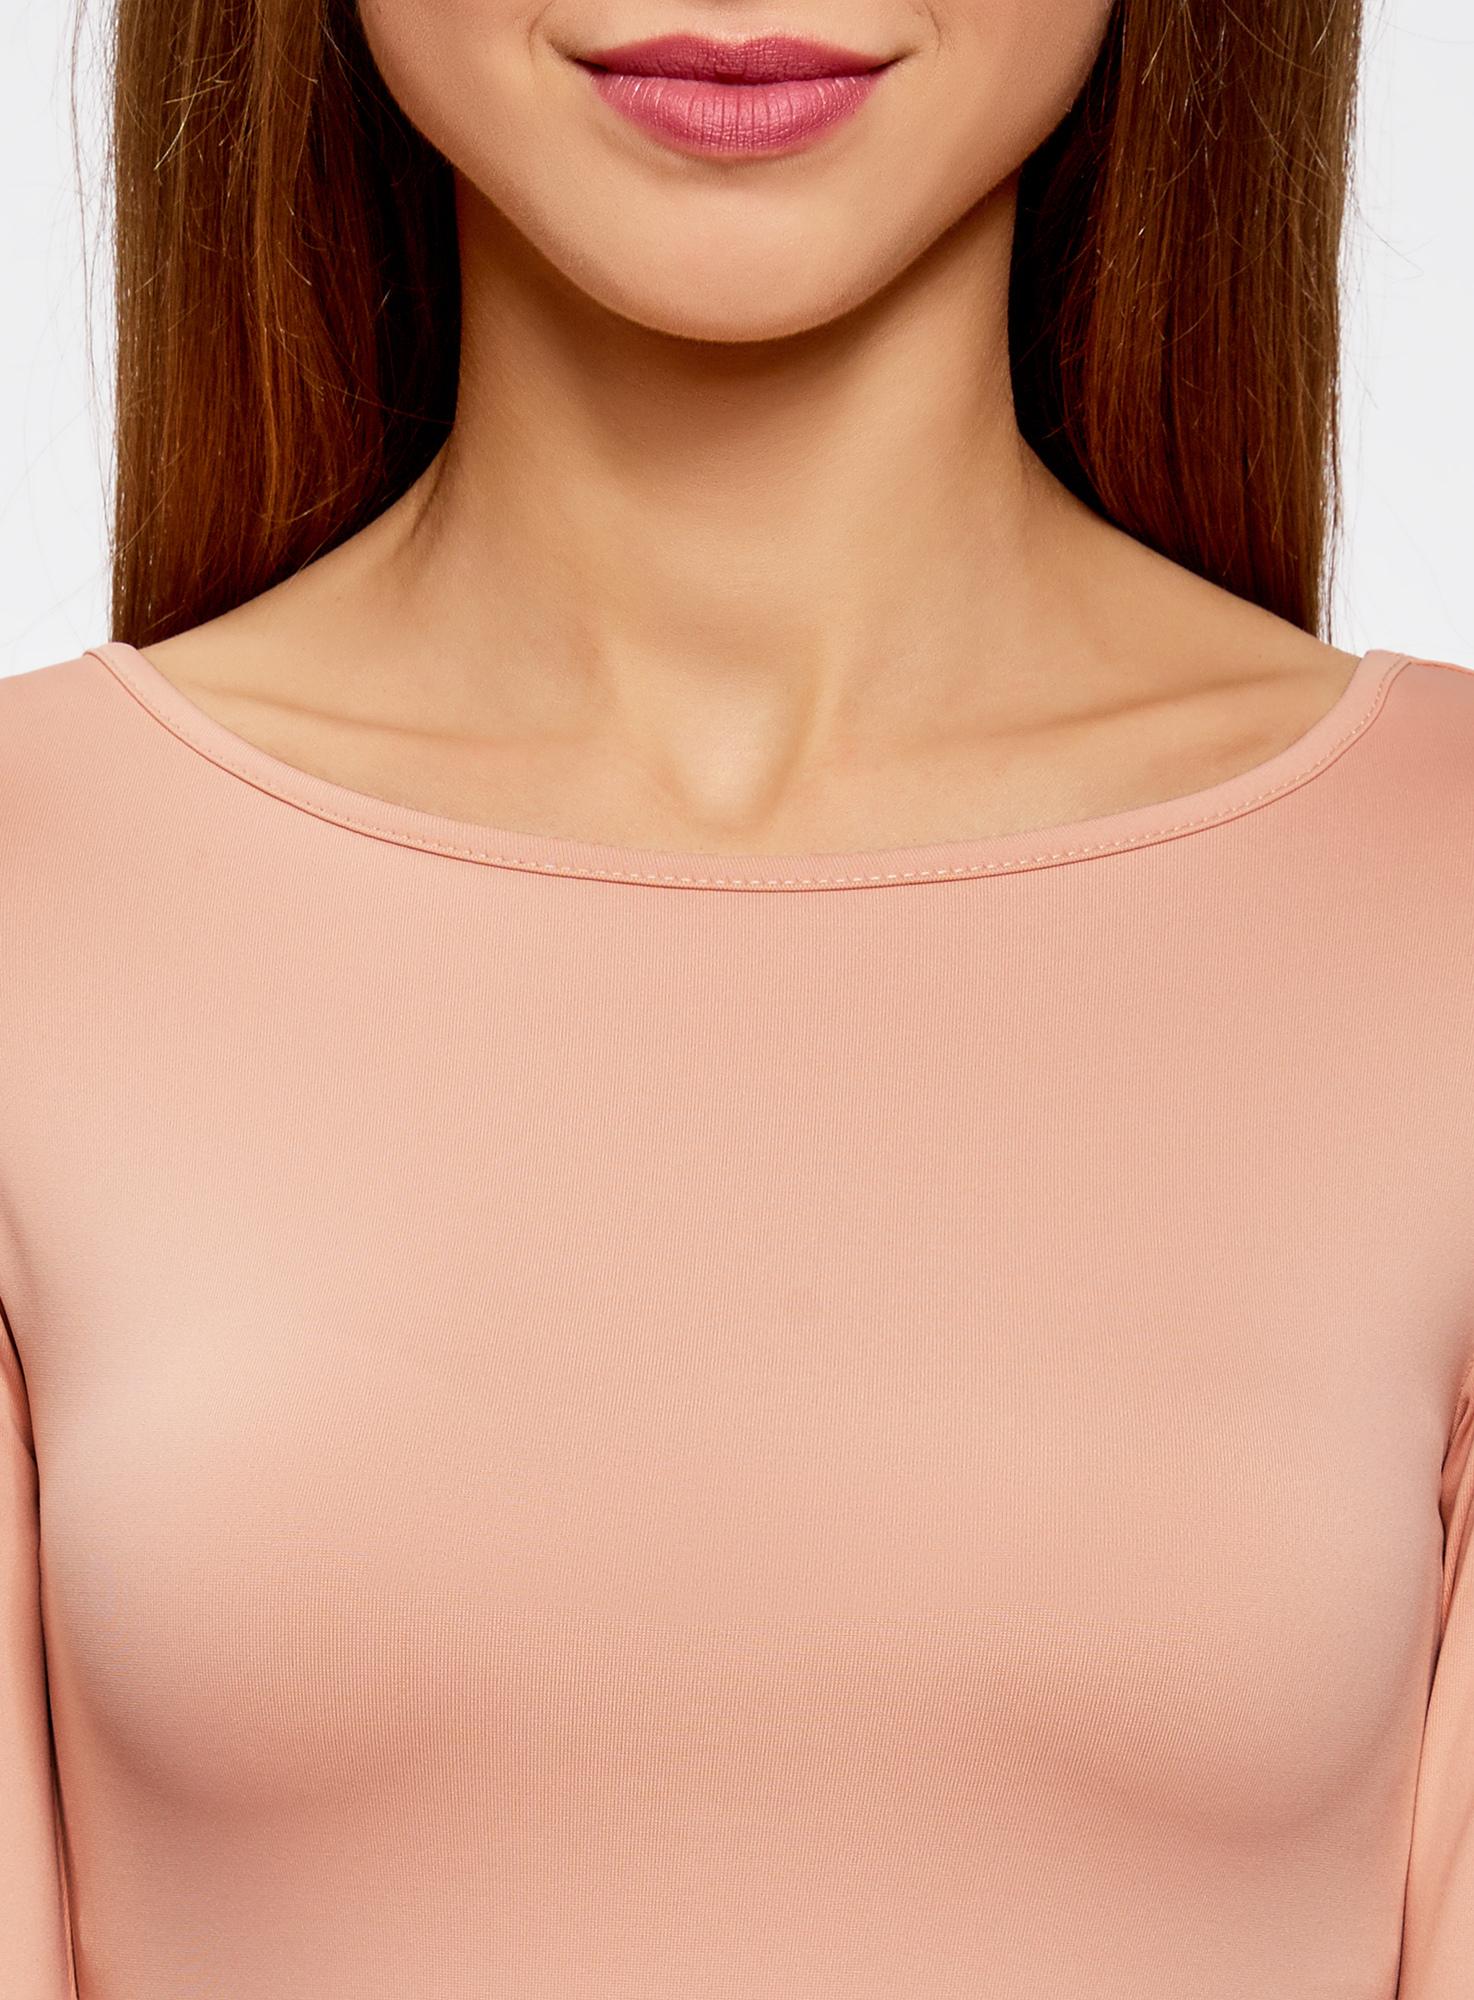 Футболка базовая с рукавом 3/4 oodji для женщины (розовый), 24211001B/45297/4B00N